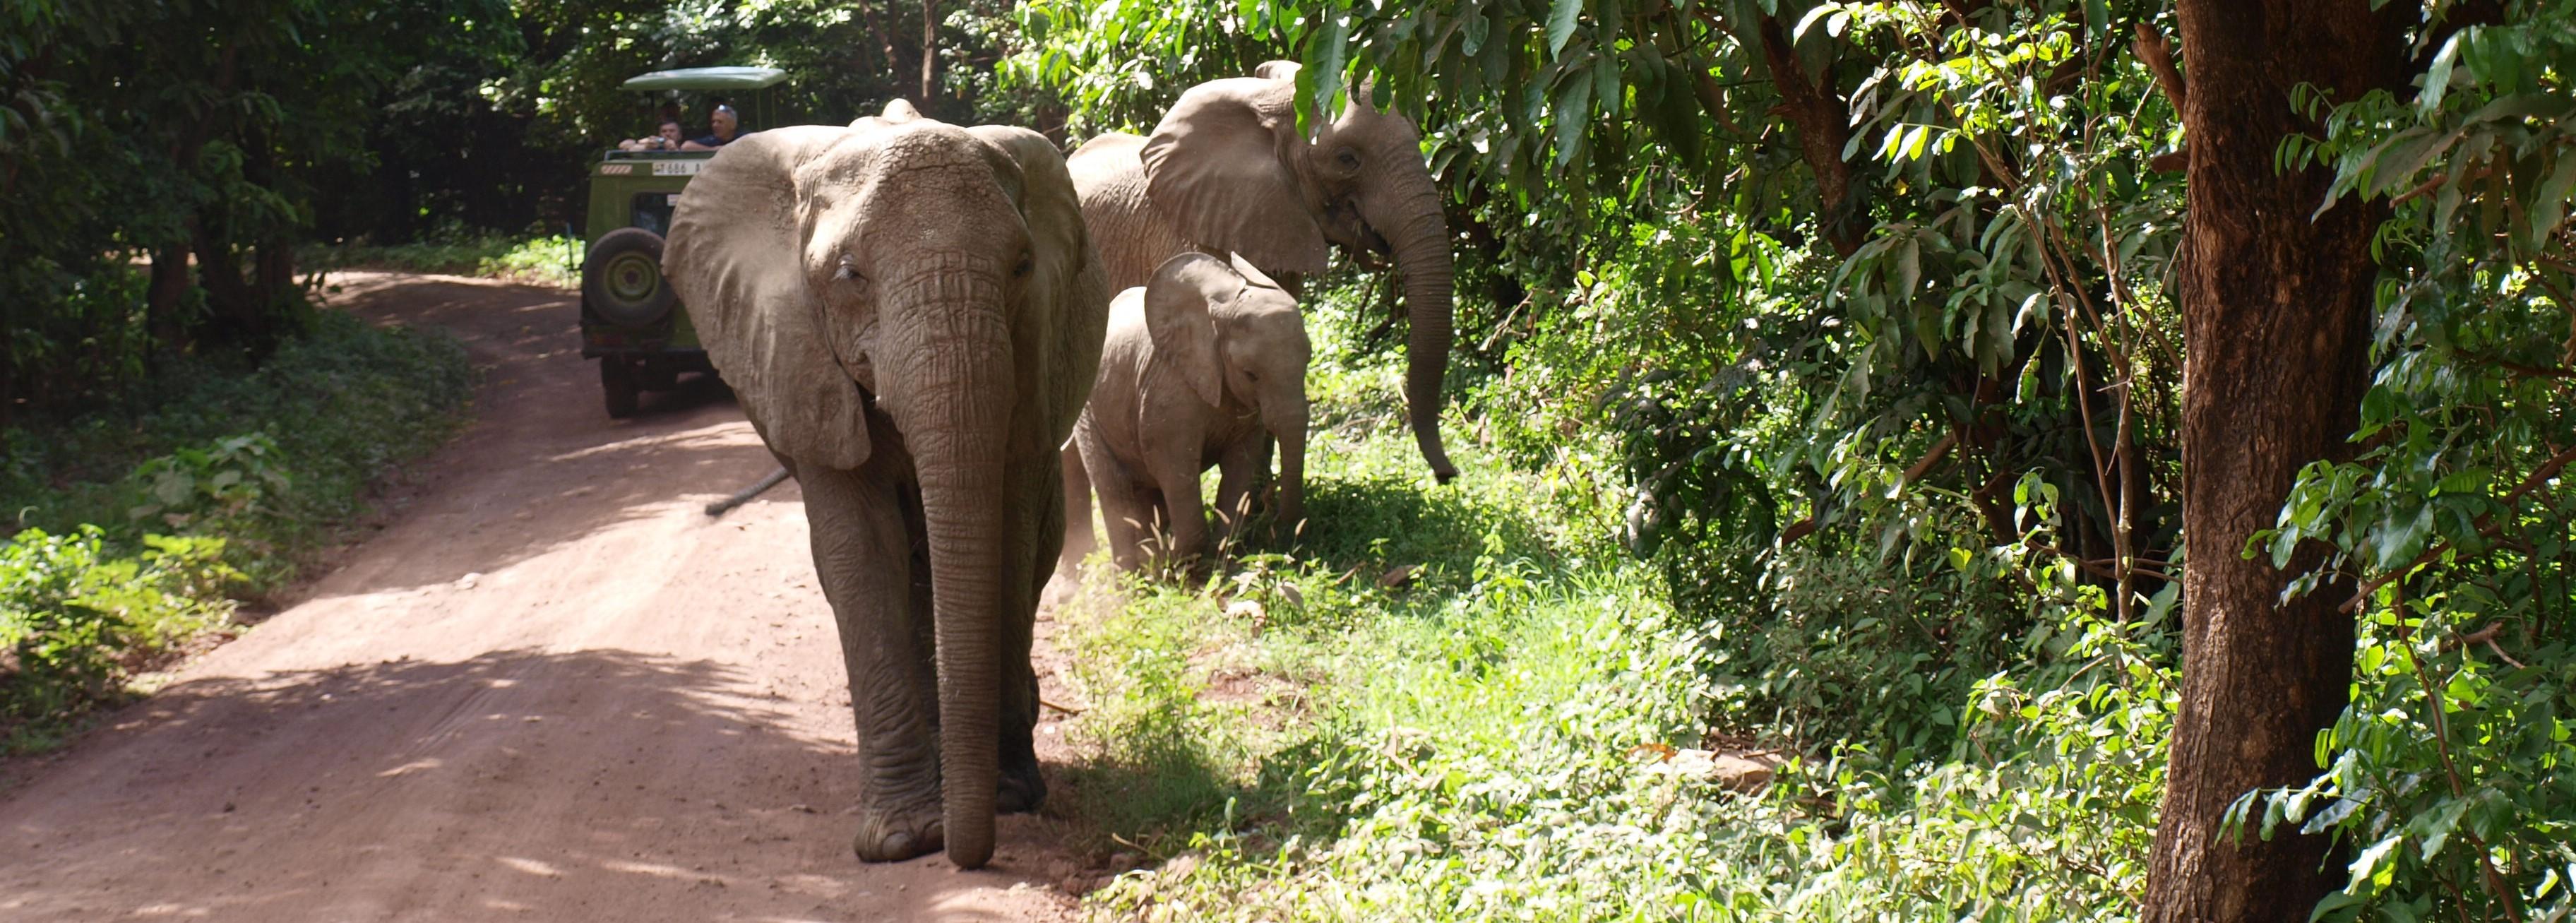 elephants by jeep in lake manyara